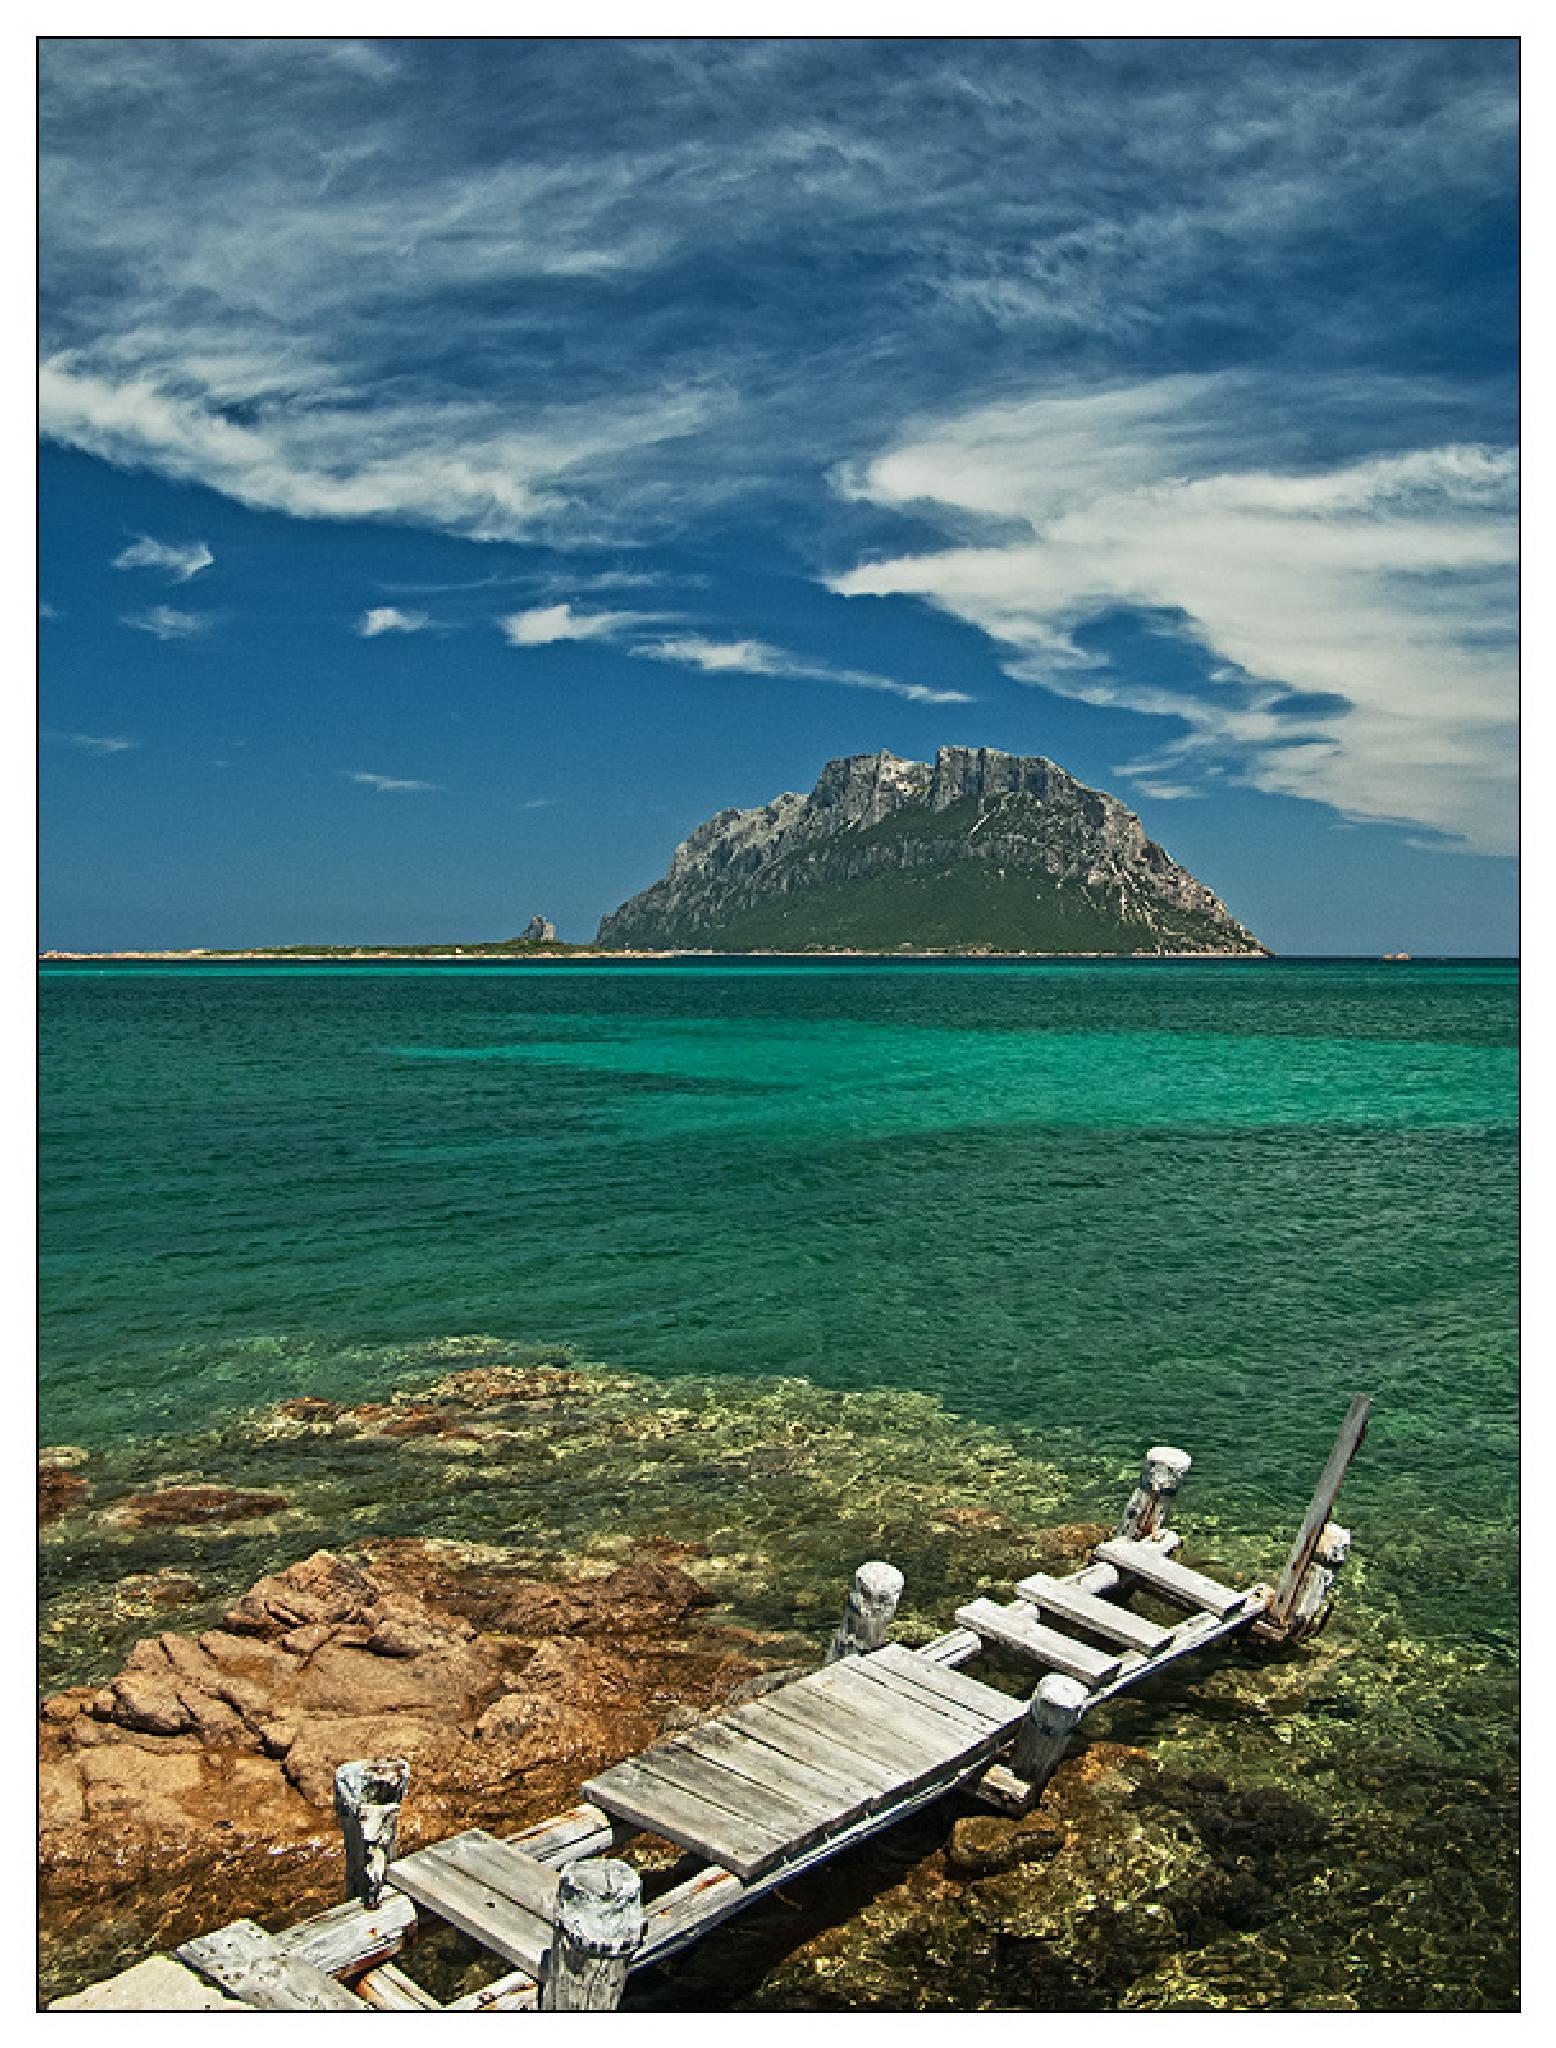 Island of Tavolara by longroute